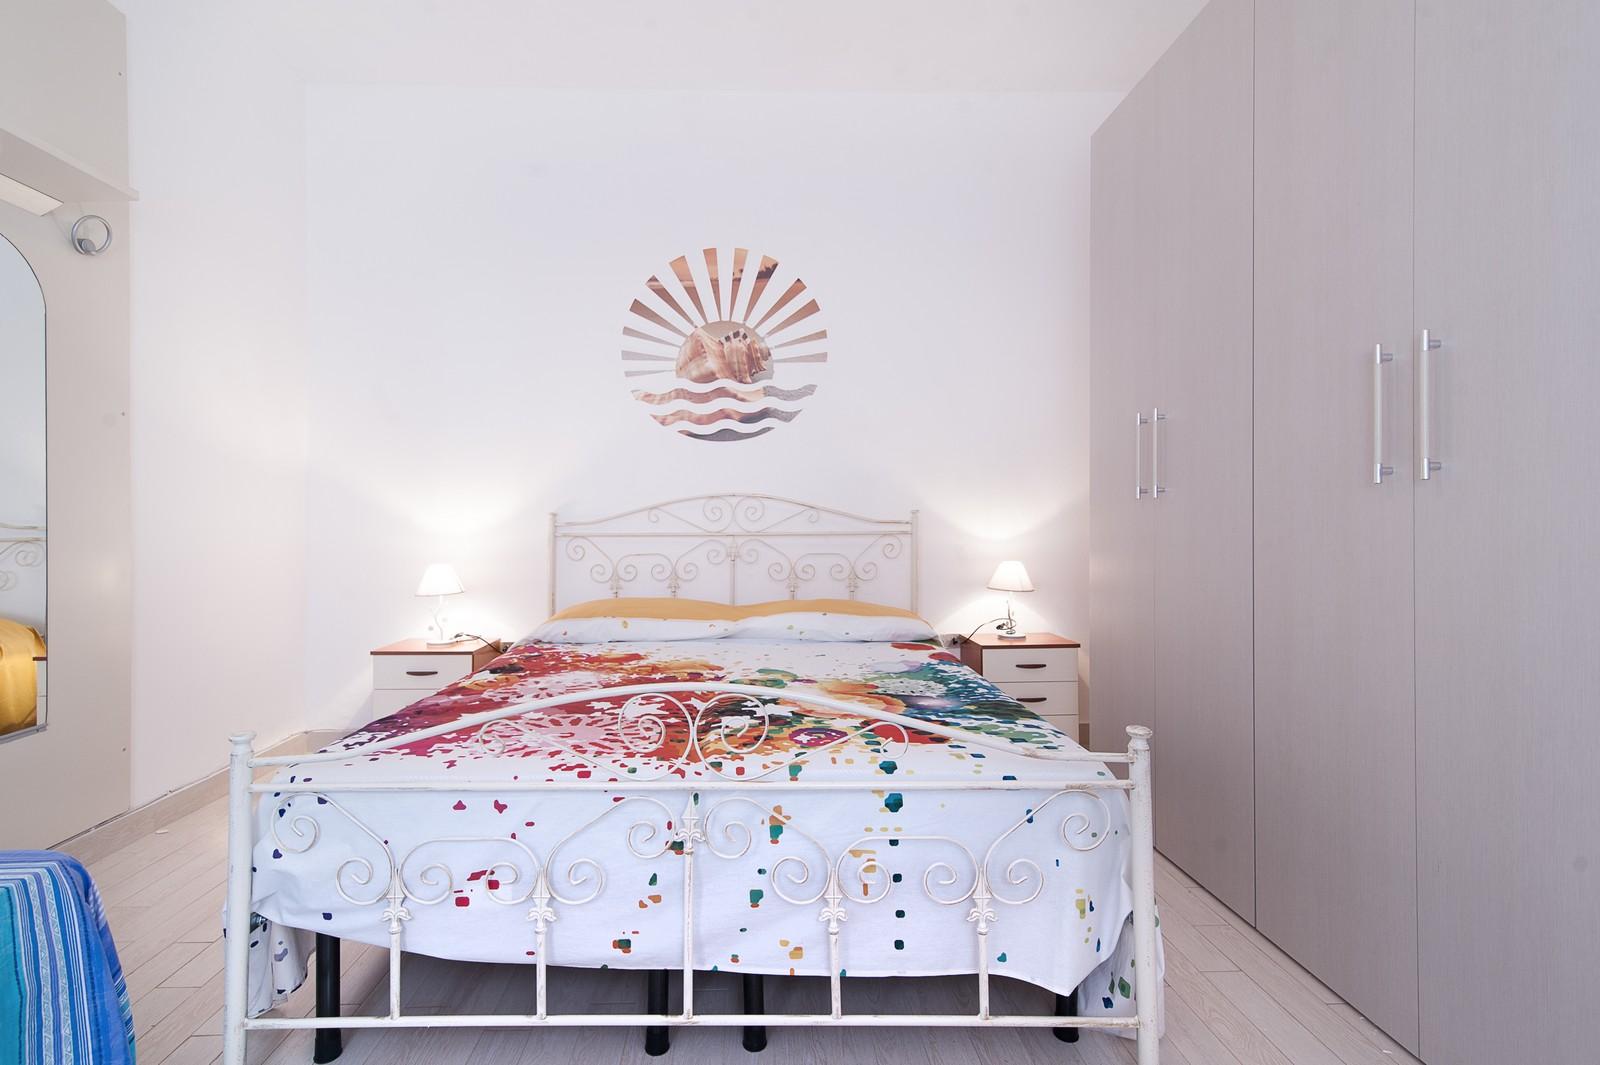 Ferienhaus Villa Mariposa  n. 2-150 meters from the beach (2354066), Porto Cesareo, Lecce, Apulien, Italien, Bild 10